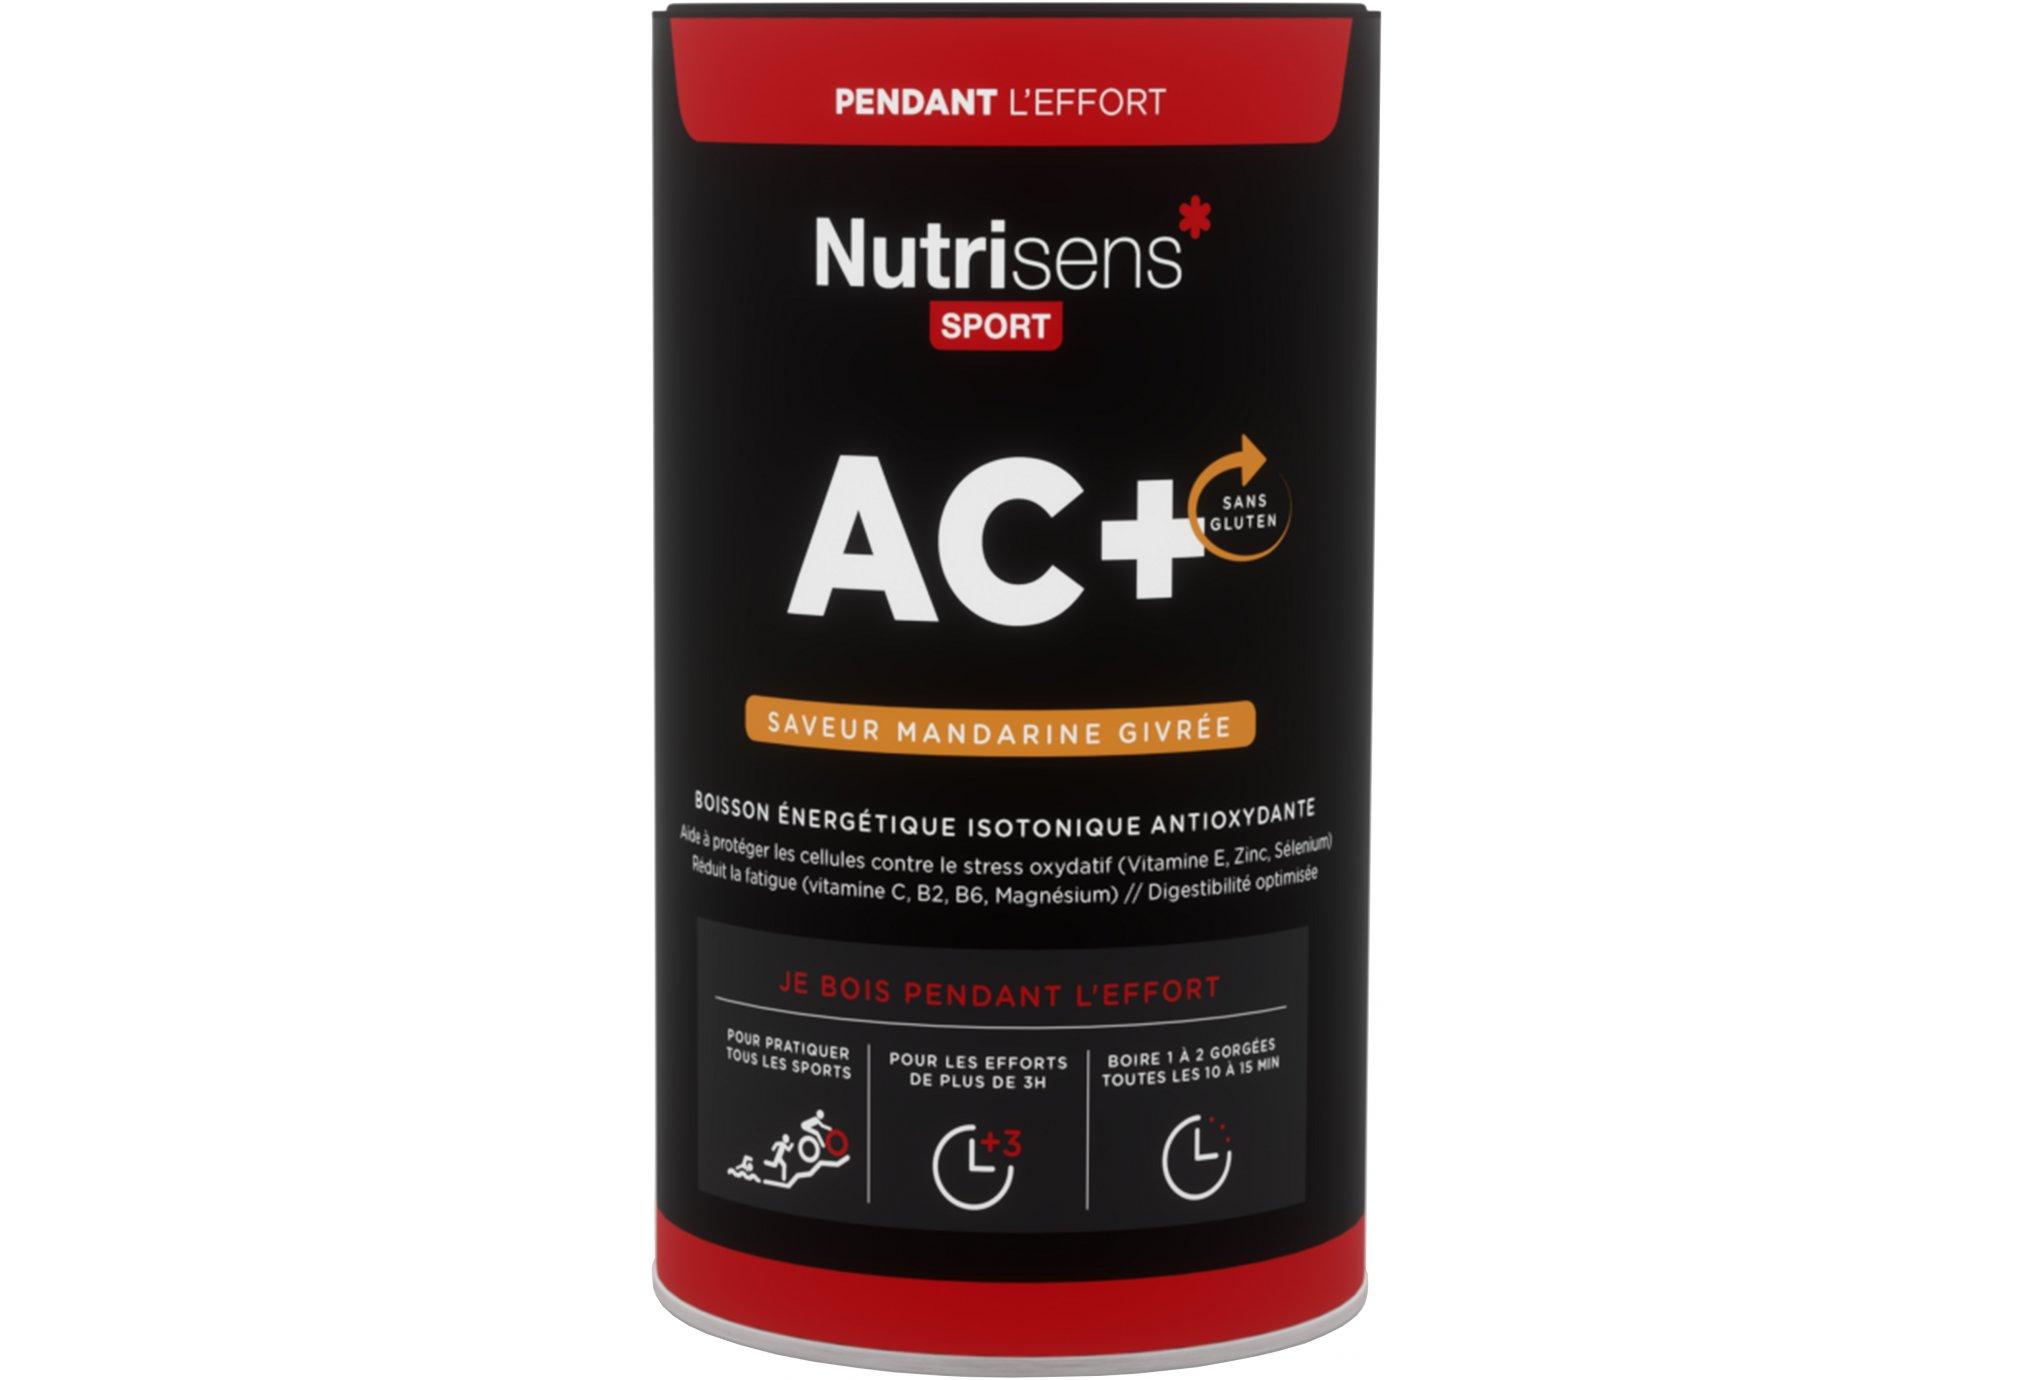 Nutrisens Sport AC+ - Sorbete de mandarina Diététique Boissons